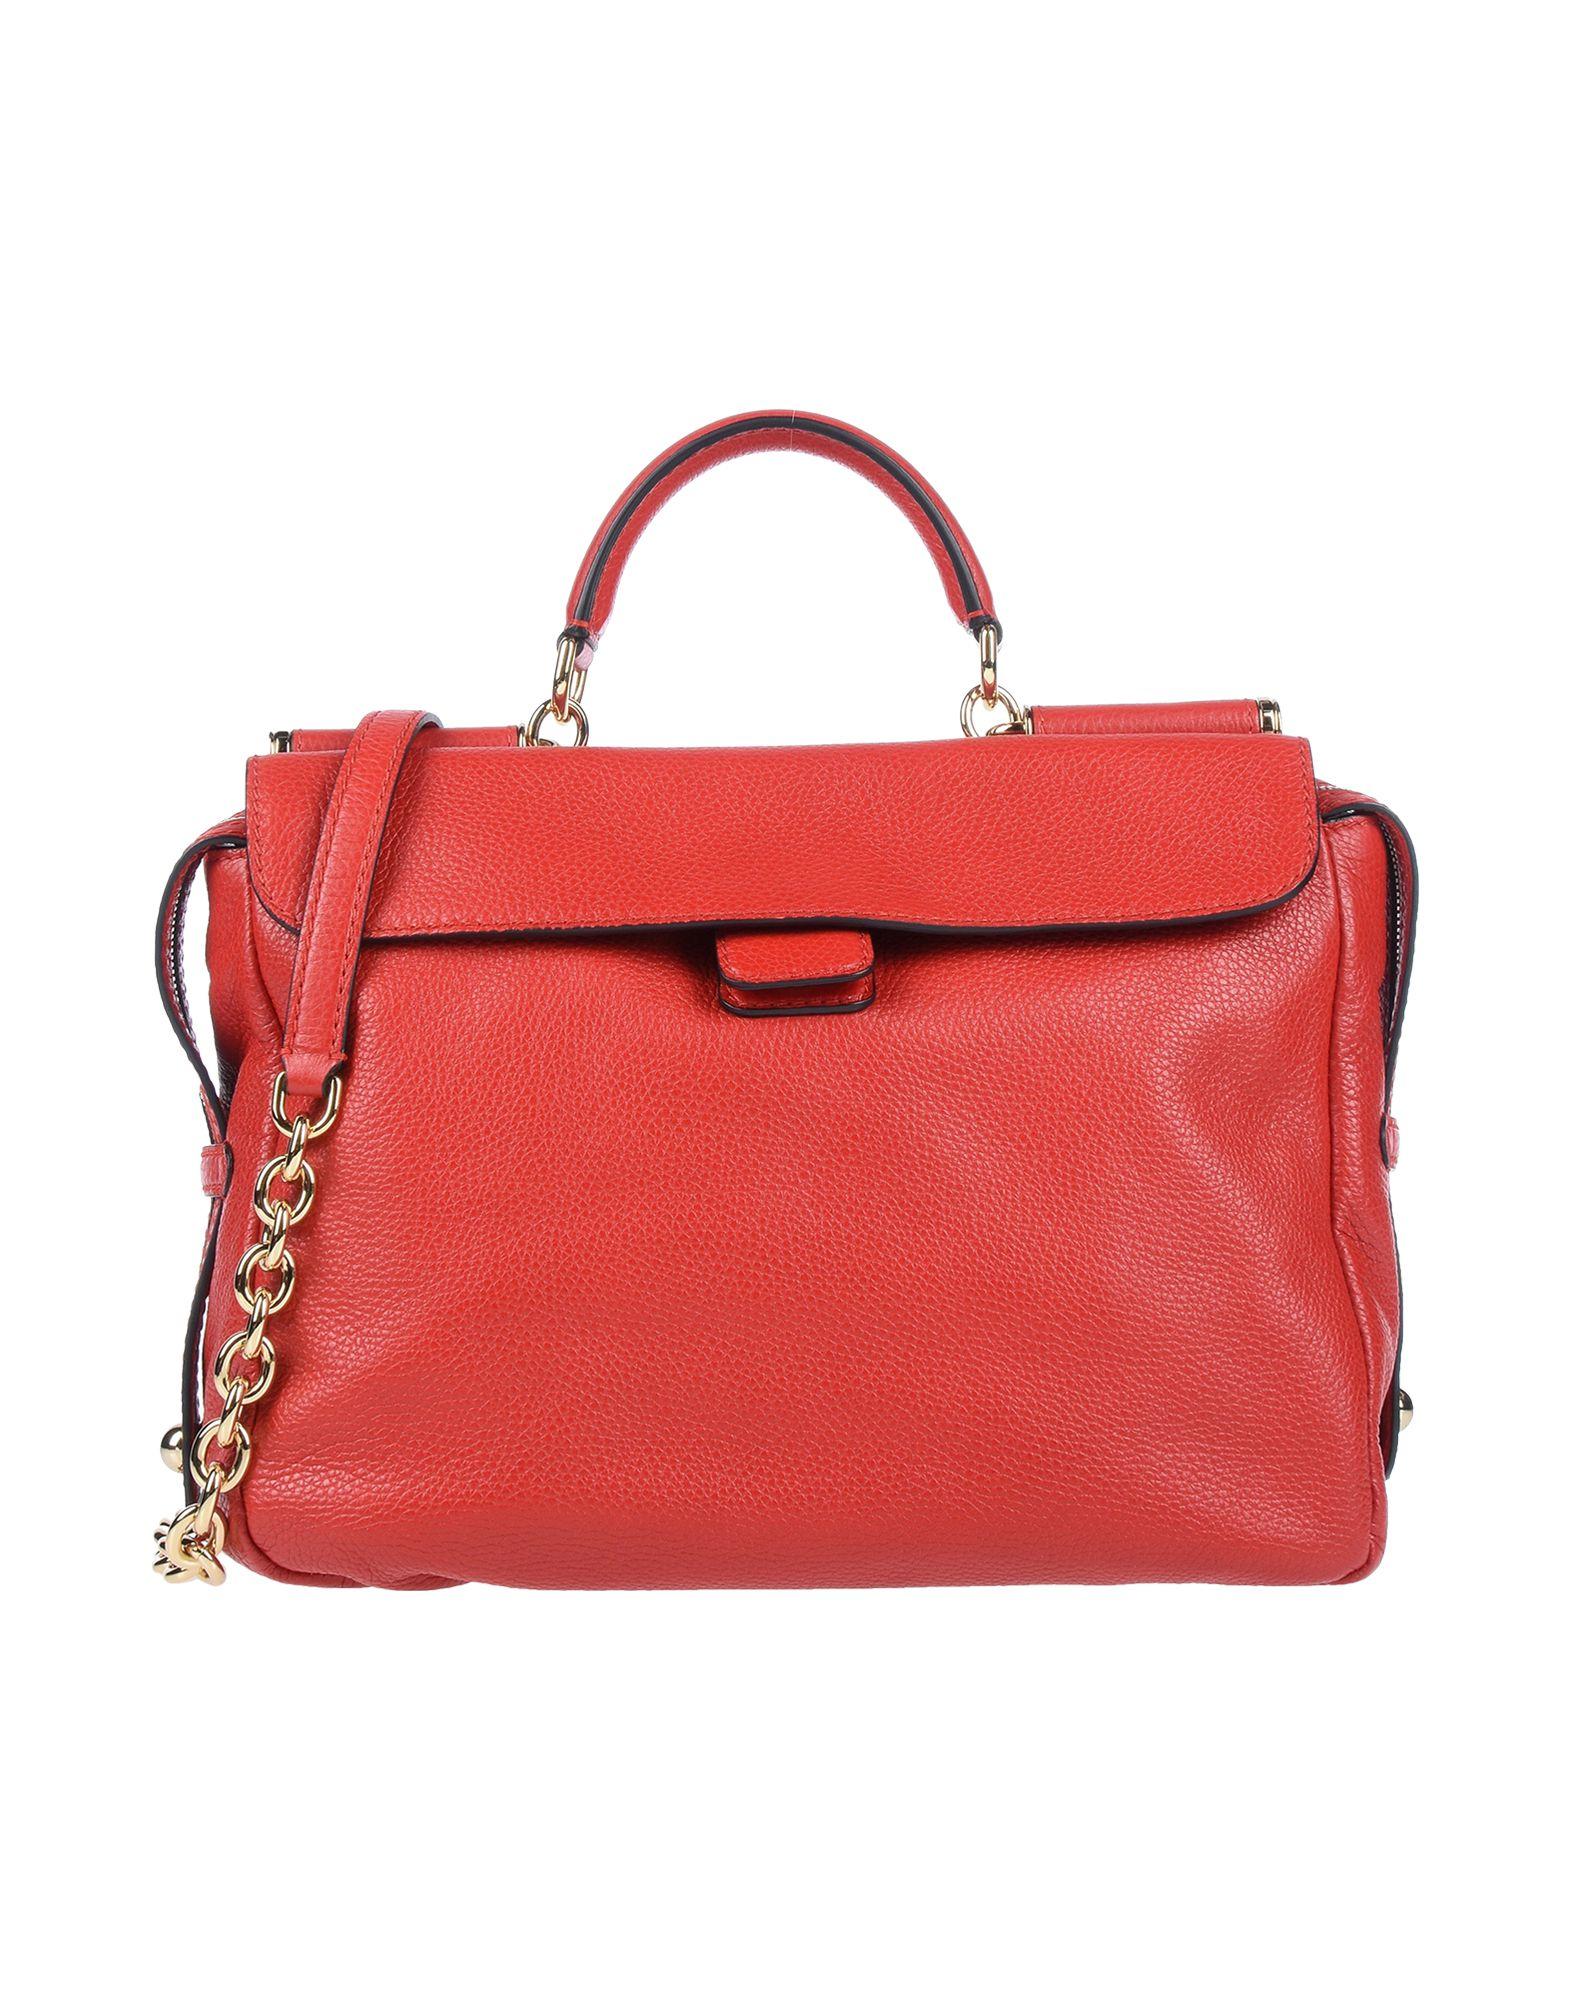 DOLCE & GABBANA Handbags - Item 45486792